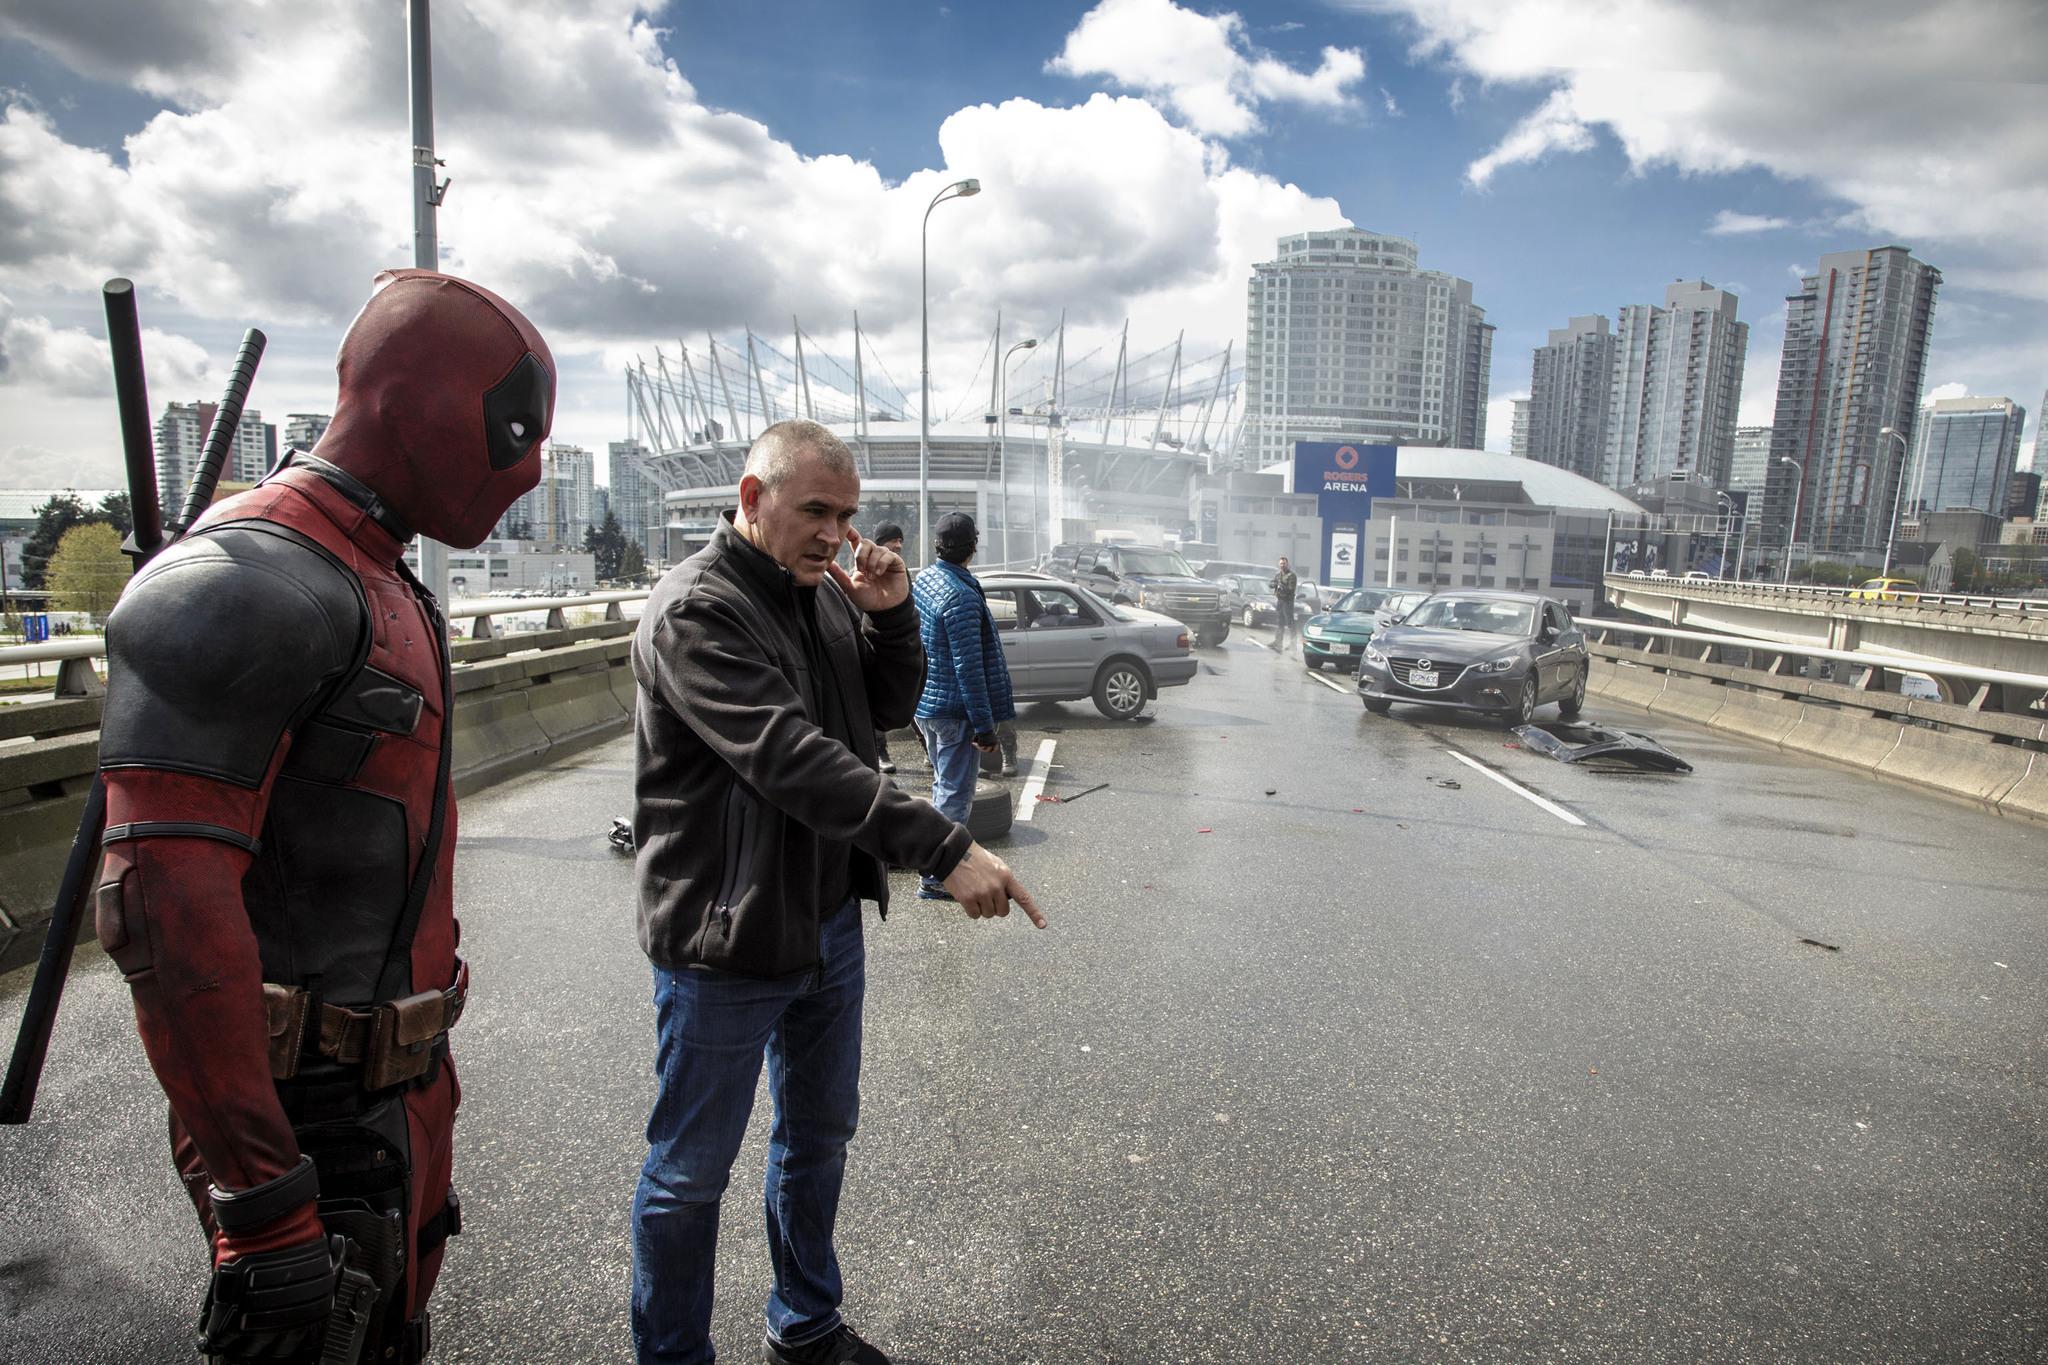 Ryan Reynolds and Tim Miller in Deadpool (2016)